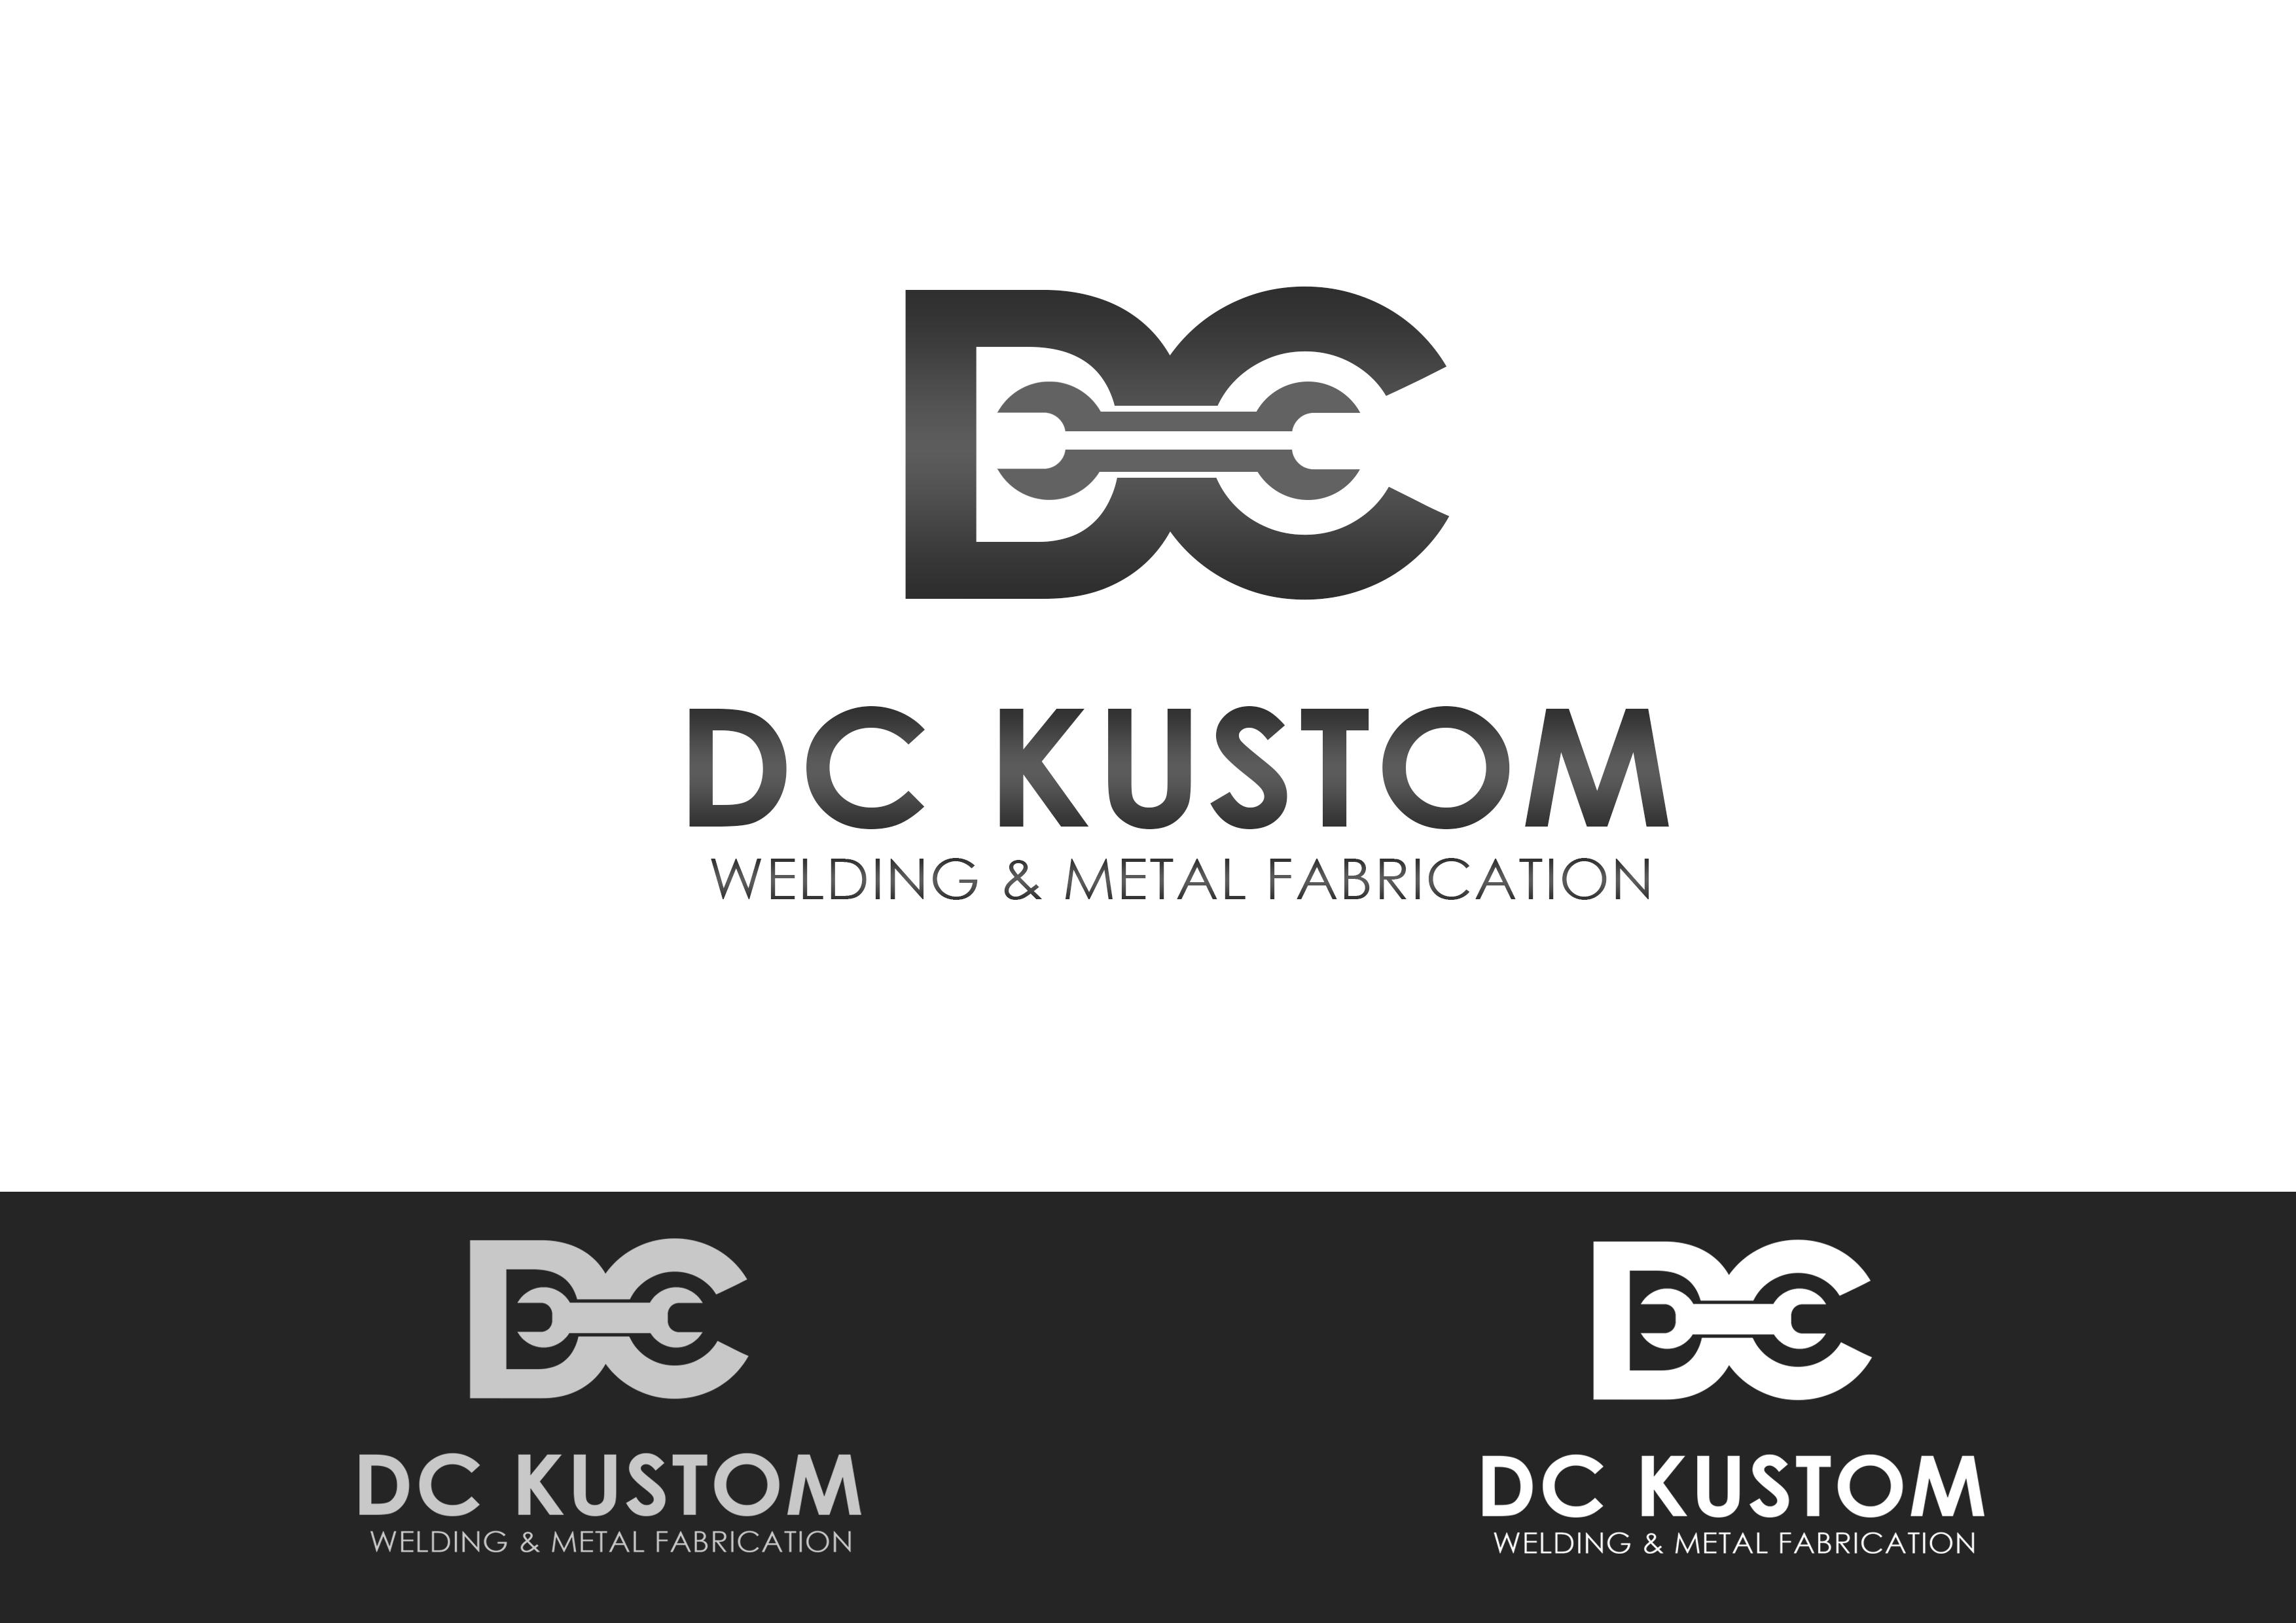 Logo Design by Jesther Jordan Minor - Entry No. 145 in the Logo Design Contest Imaginative Logo Design for DC KUSTOM WELDING & METAL FABRICATION.